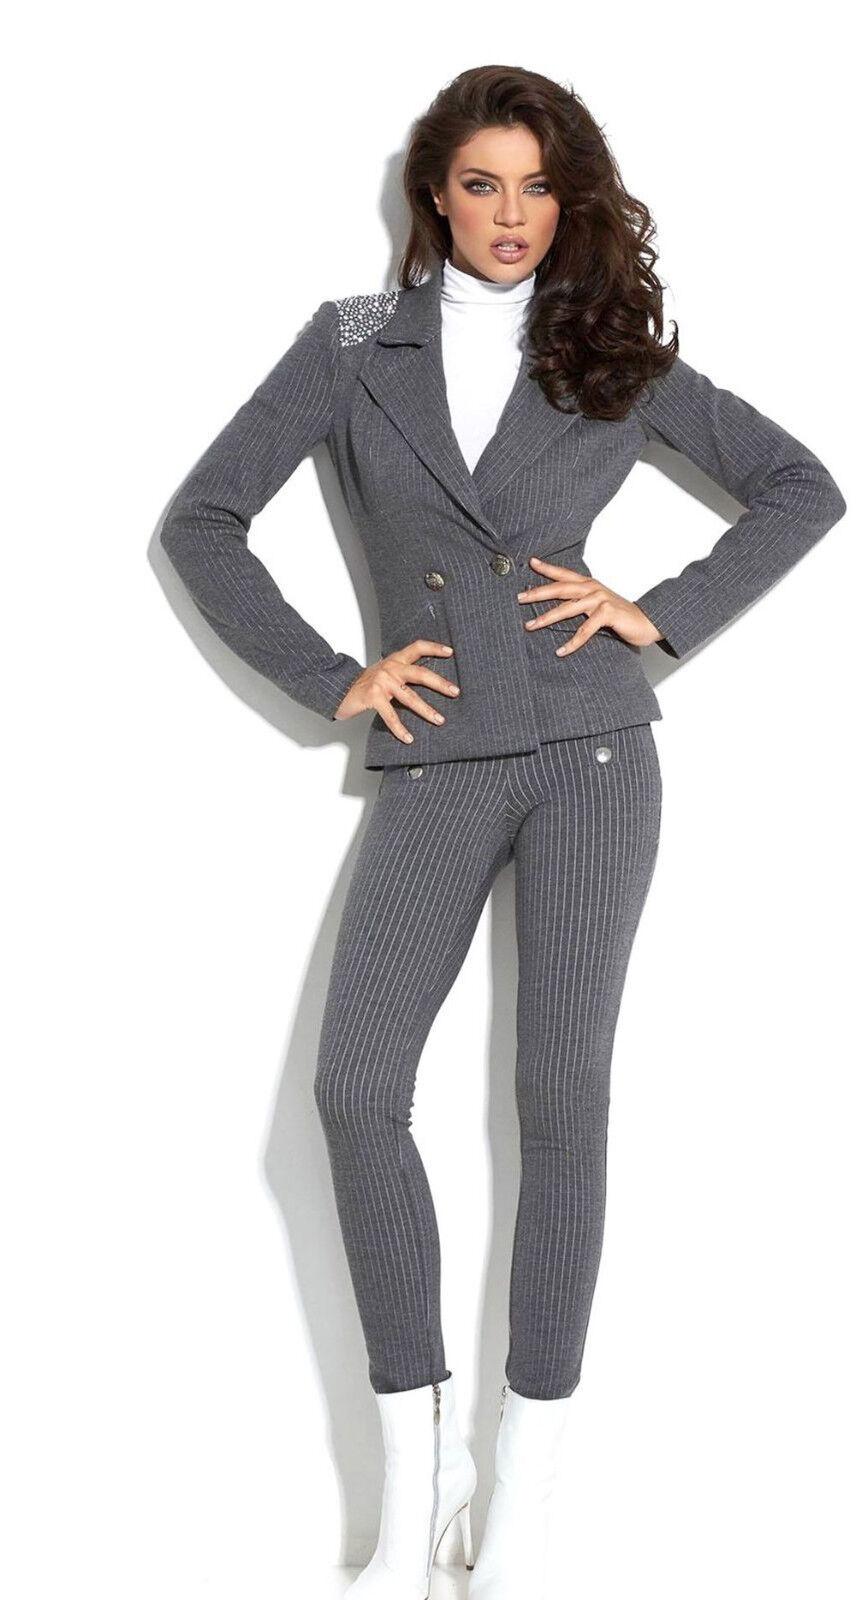 Av Alina 2 -Divider bussiness Blazer Trouser Dräkt Pinrande Skinny Trousers grå XS -M